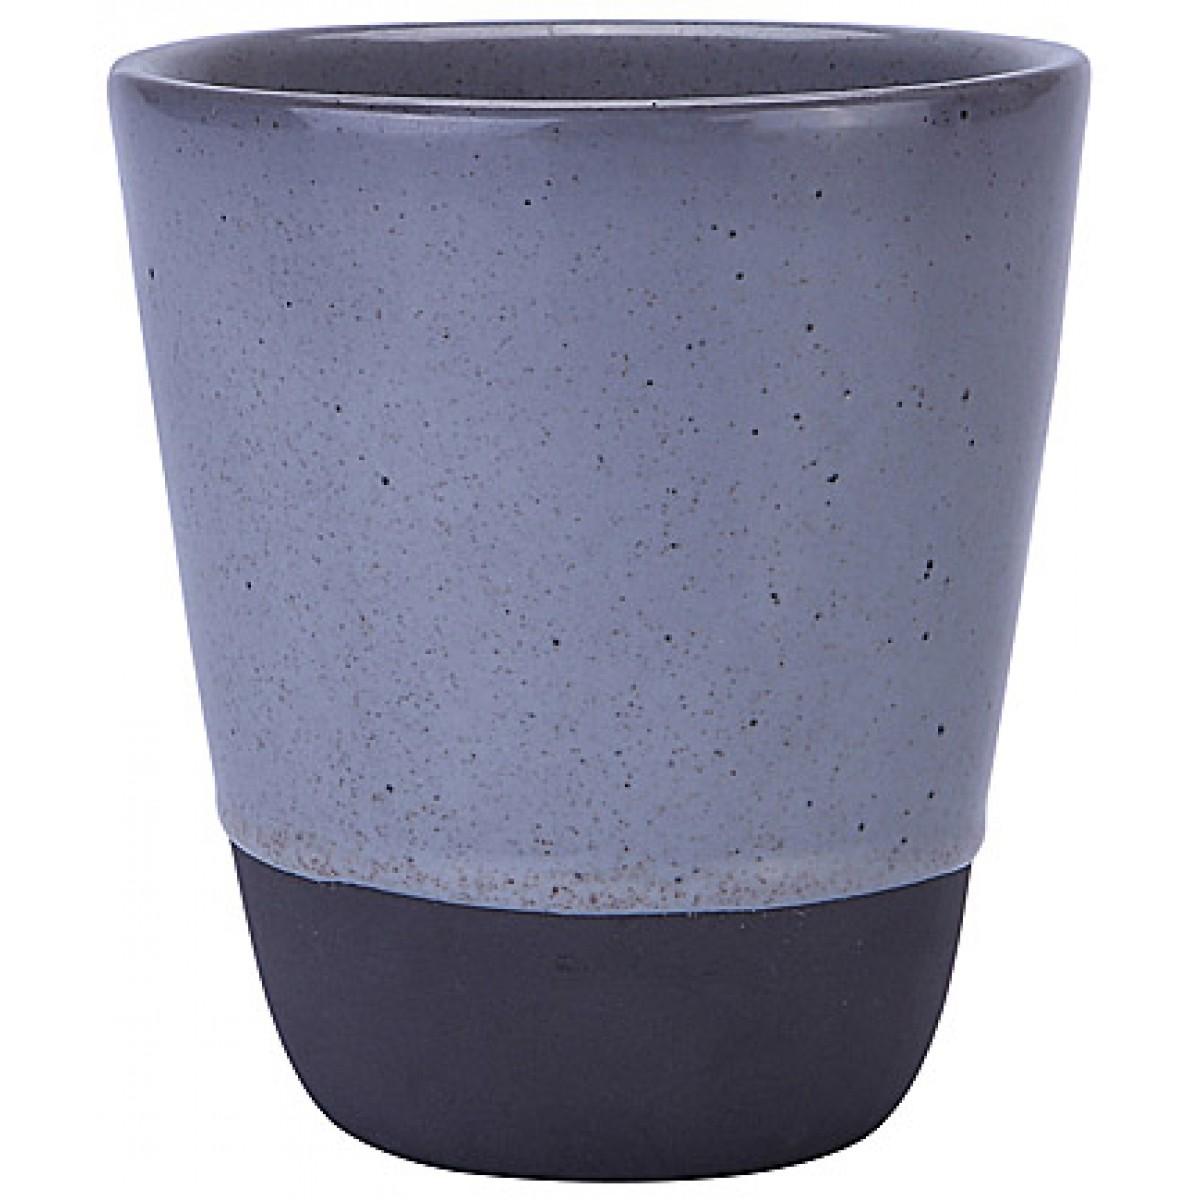 AIDA Raw termo krus grå 30 cl.